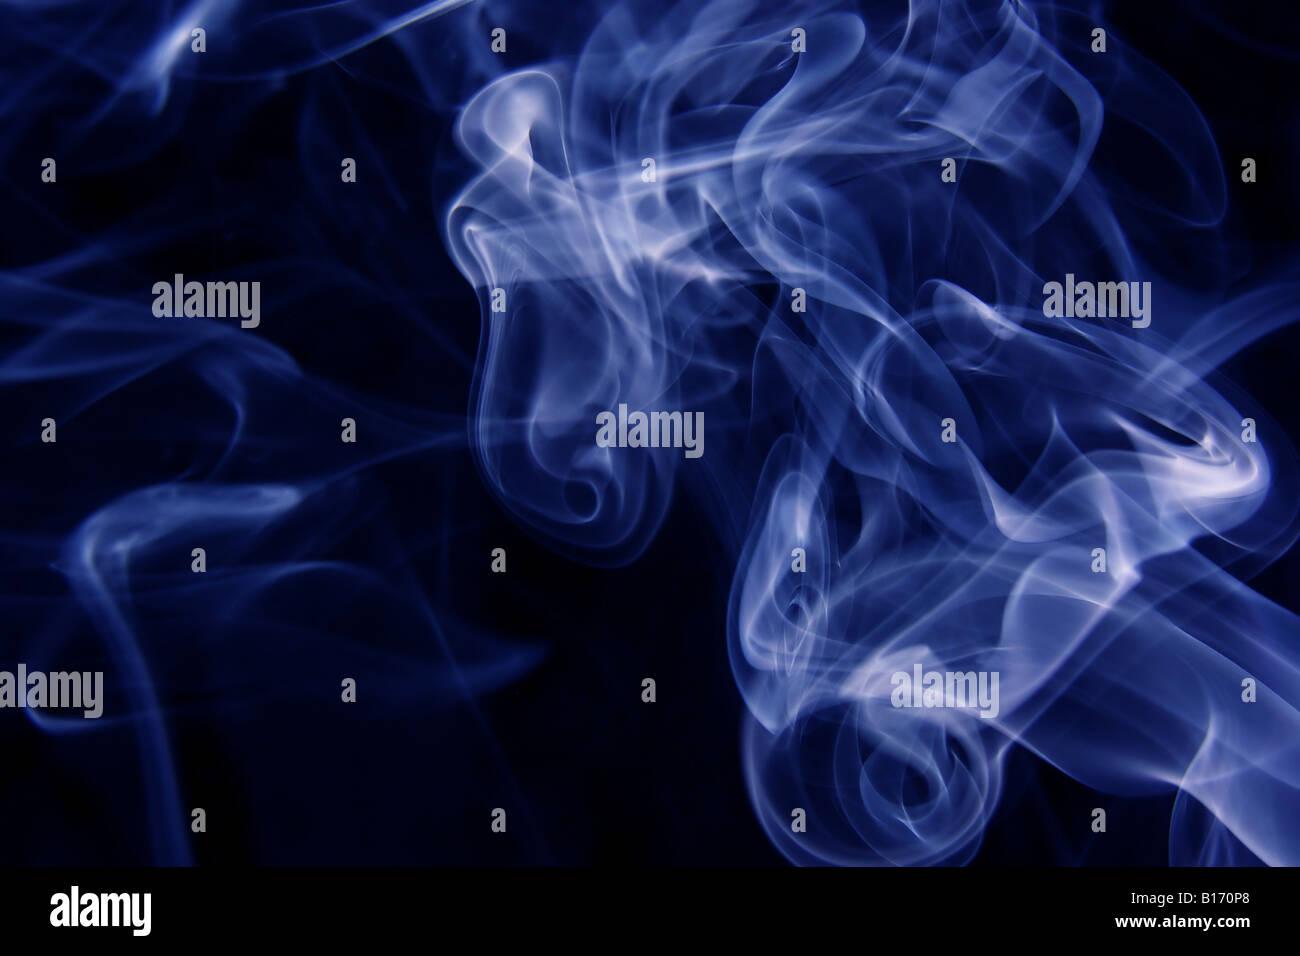 Background of swirling smoke - Stock Image